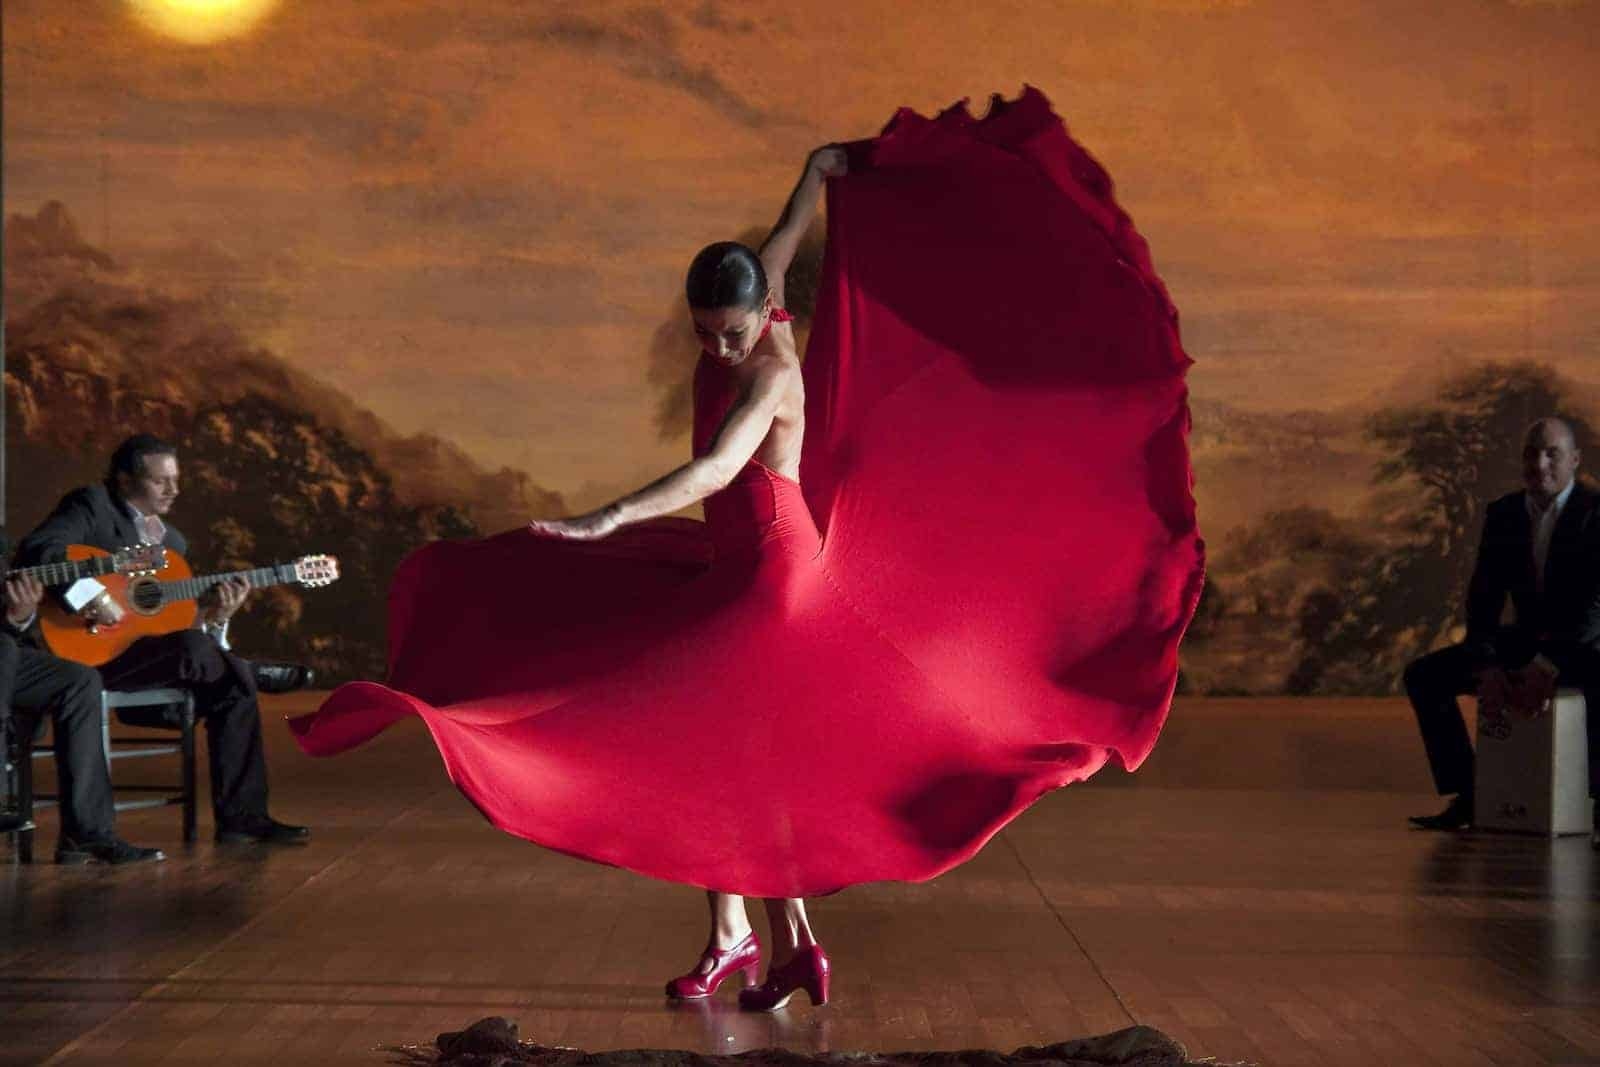 Концерт «Звёзды Испанского фламенко. Мария Морено» в Москве